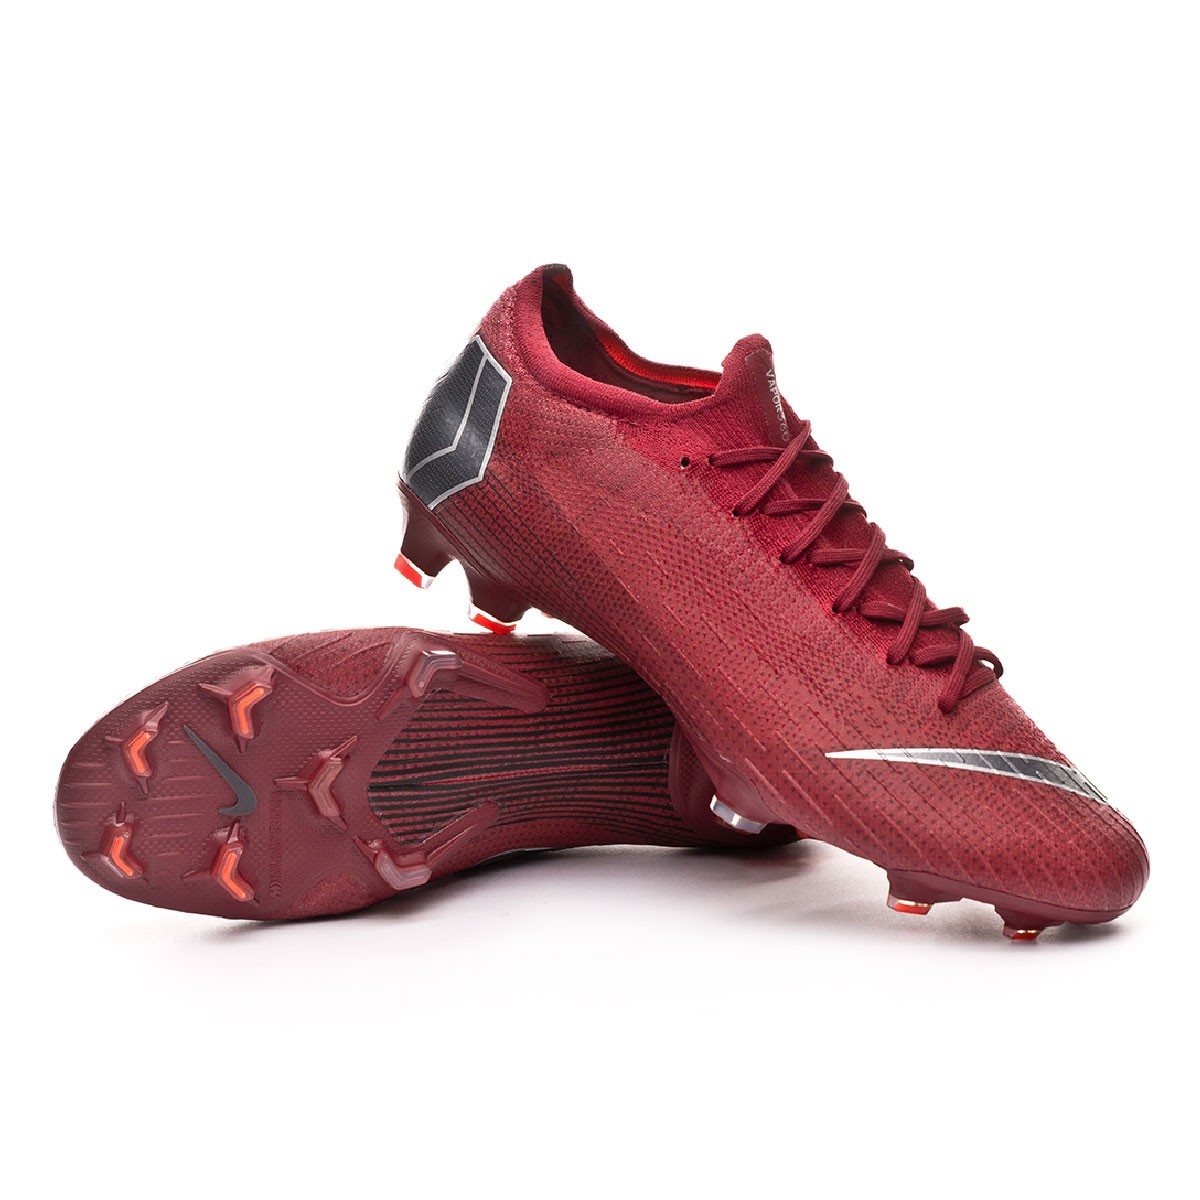 Nike Mercurial Vapor XII 12 Elite Firm